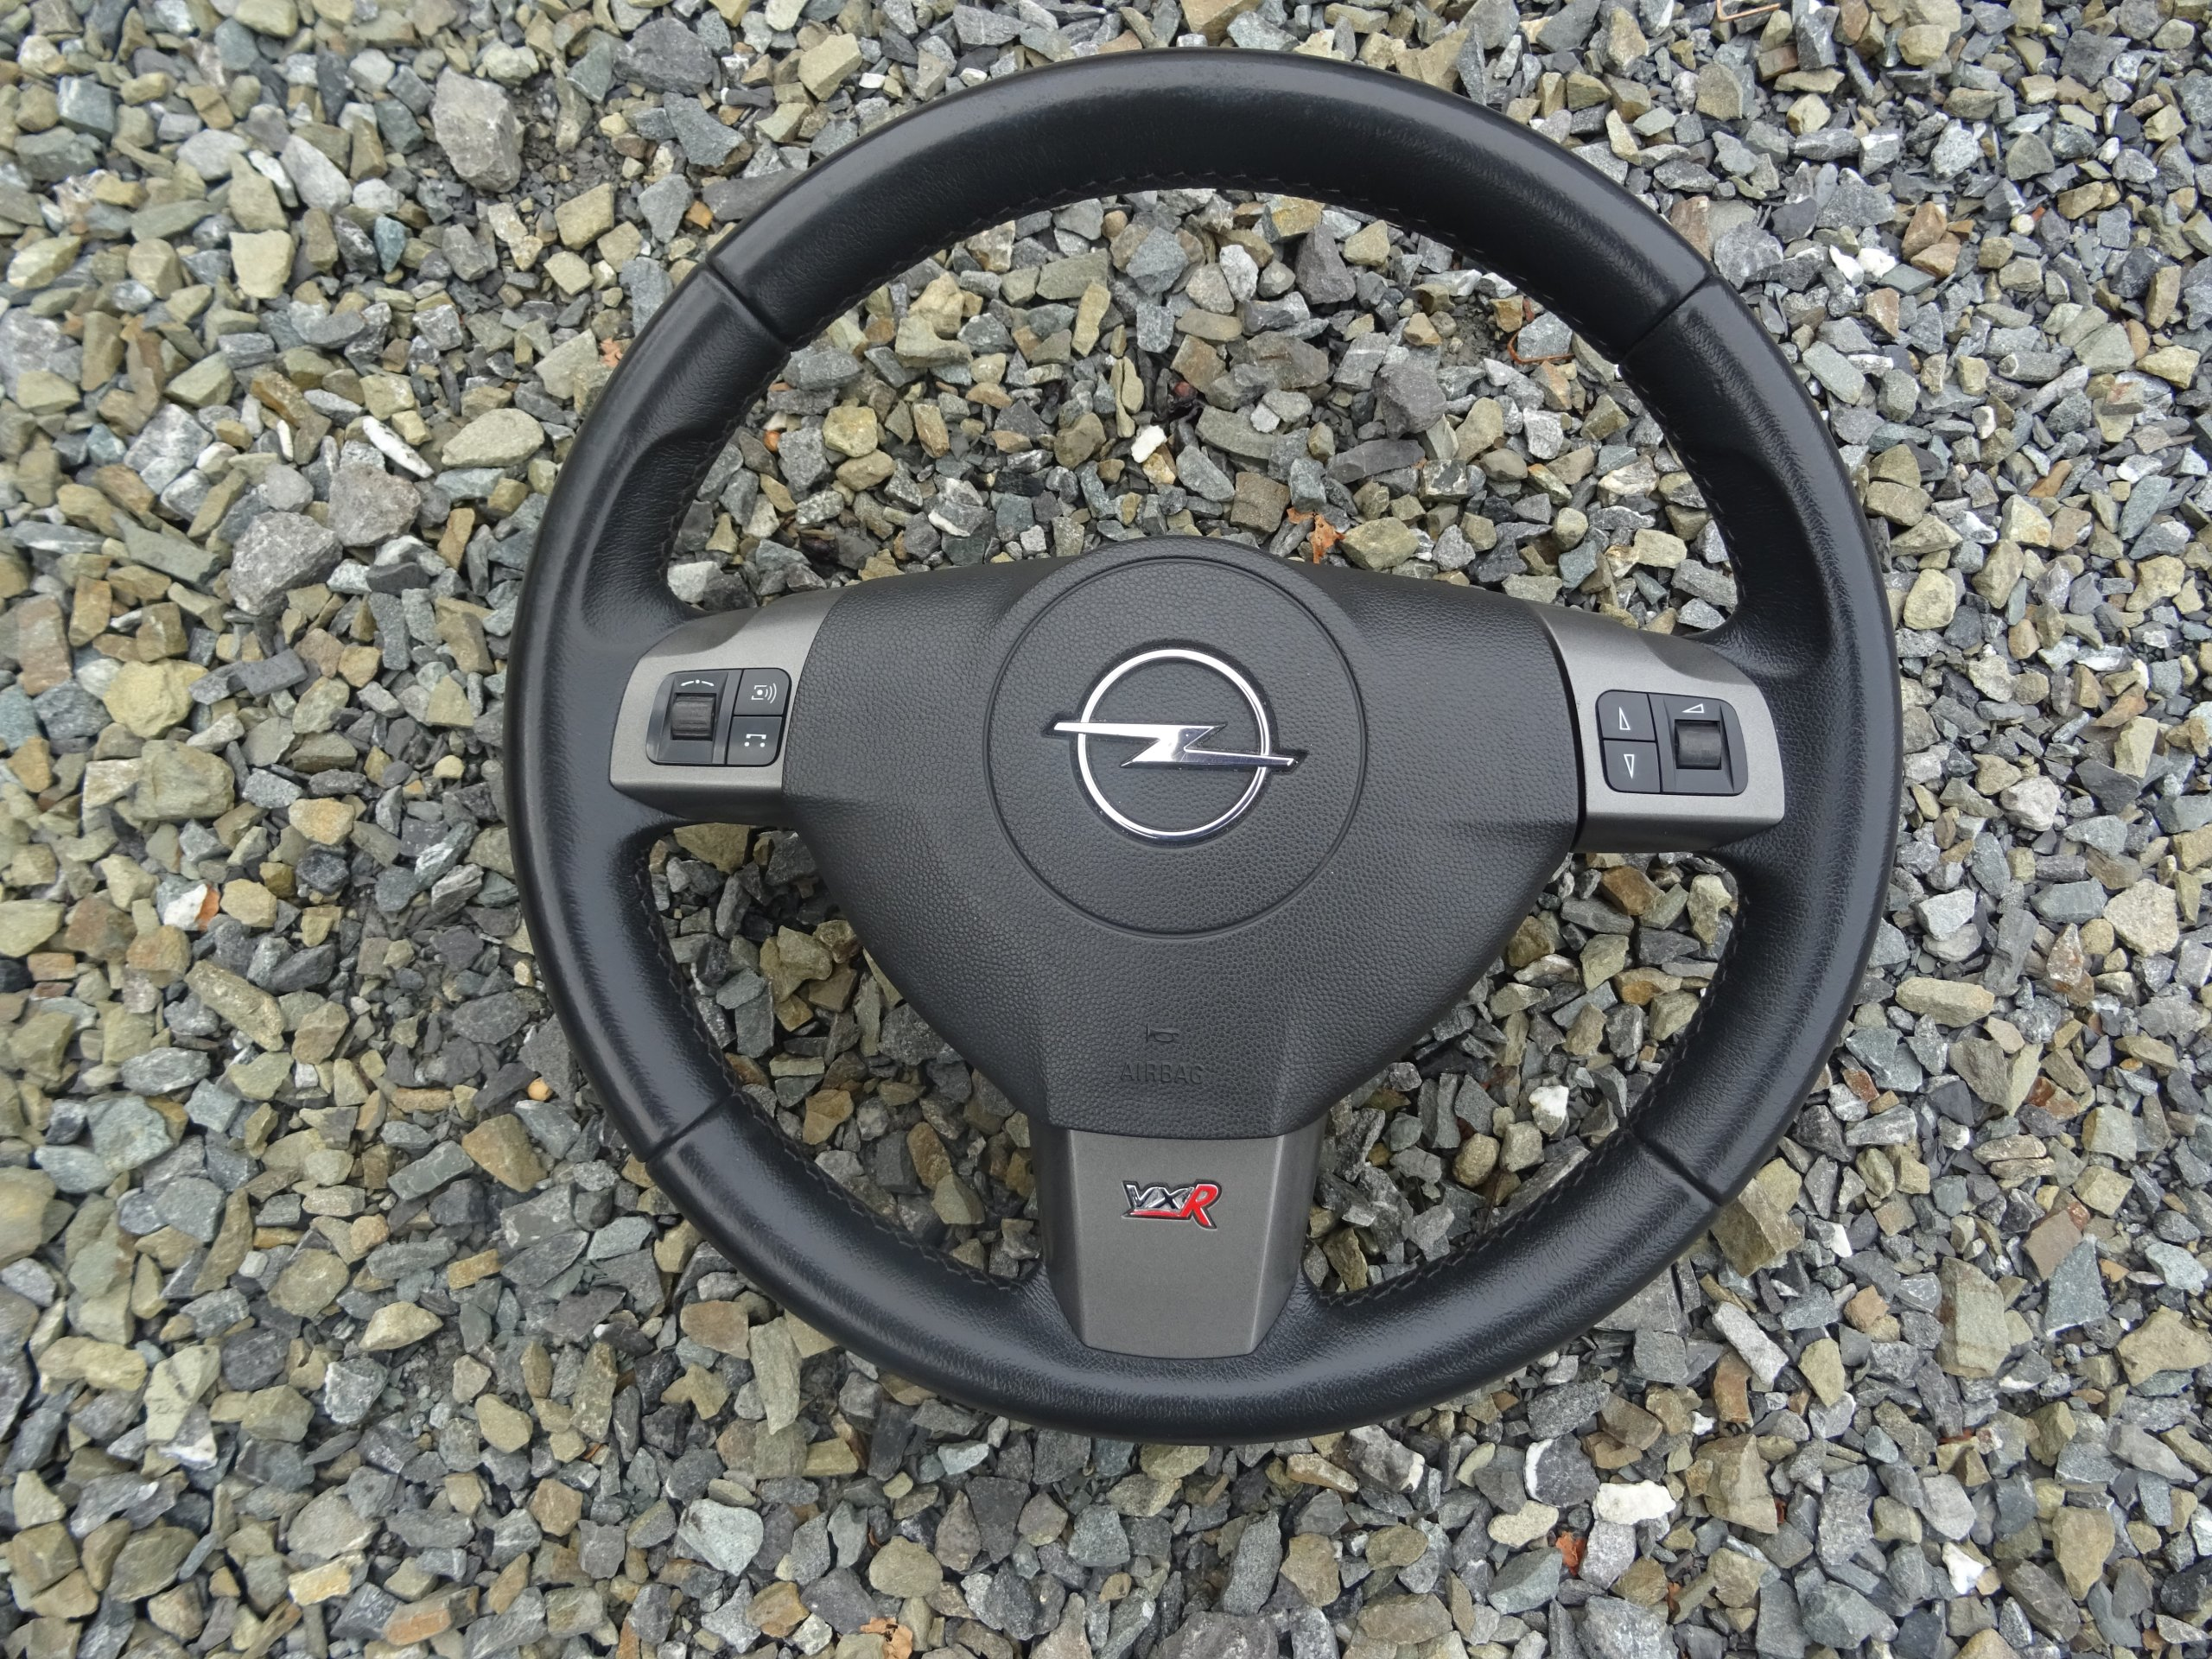 Opel Astra Iii H Kierownica Vxr Skorzana Skoczow Allegro Pl